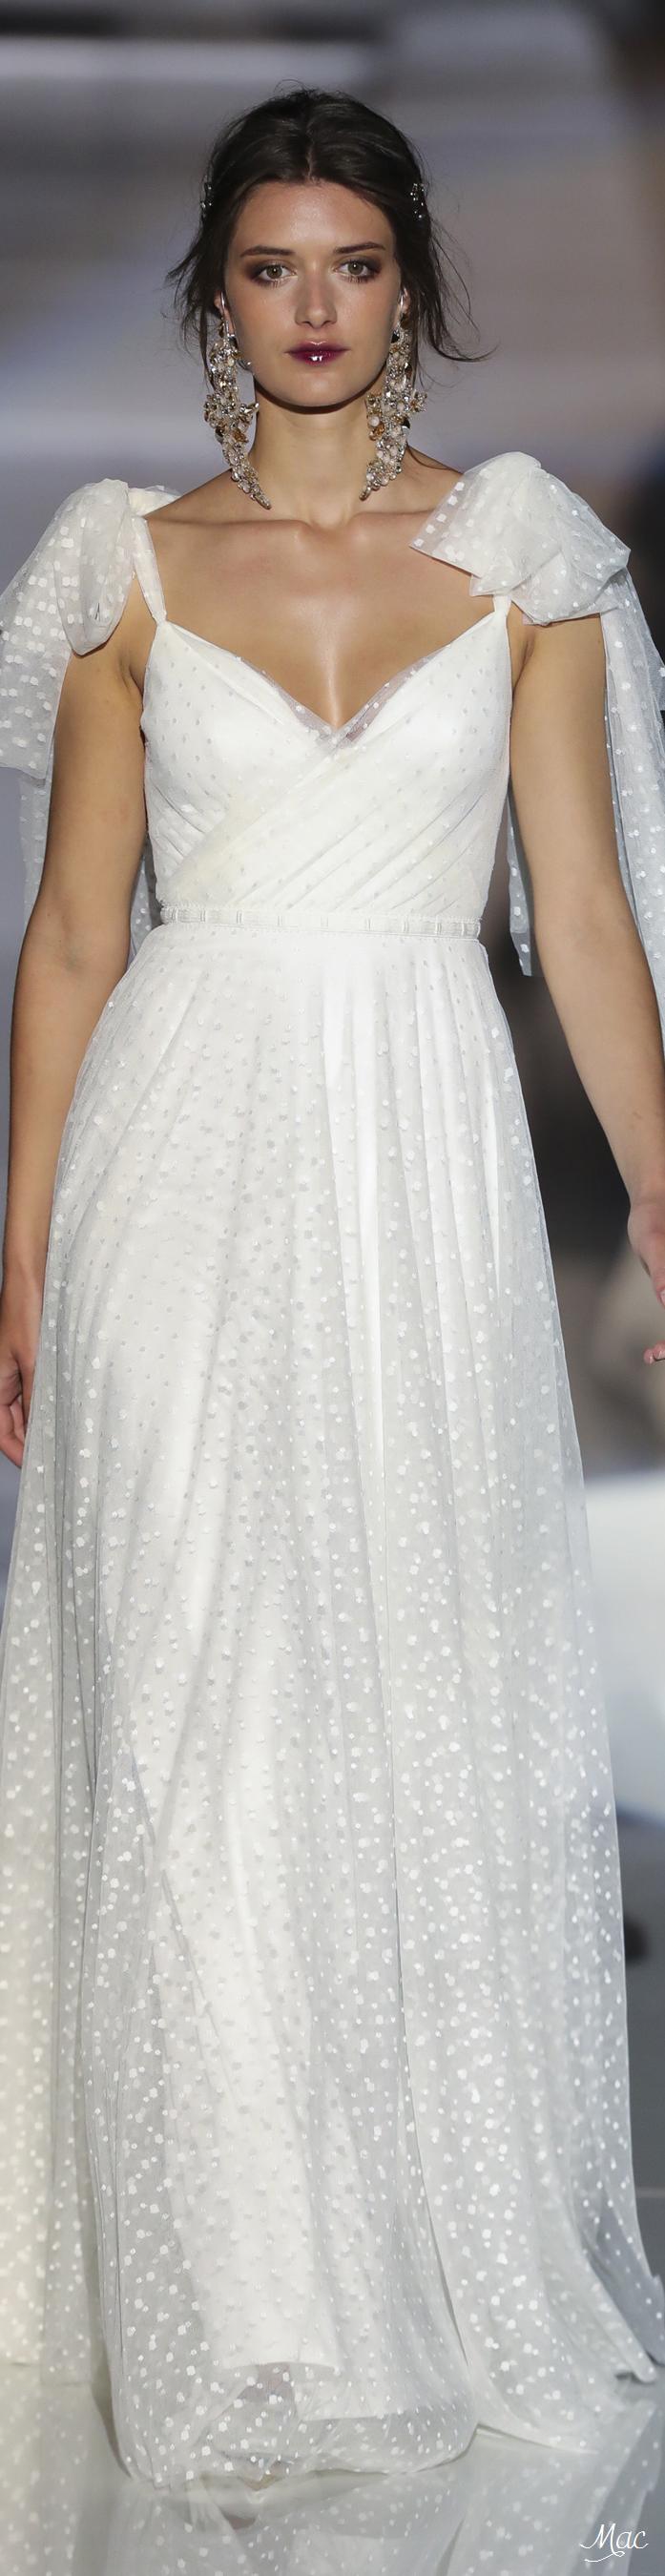 Spring 2018 Bridal Jesus Piero | •HERE COMES THE BRIDE• | Pinterest ...